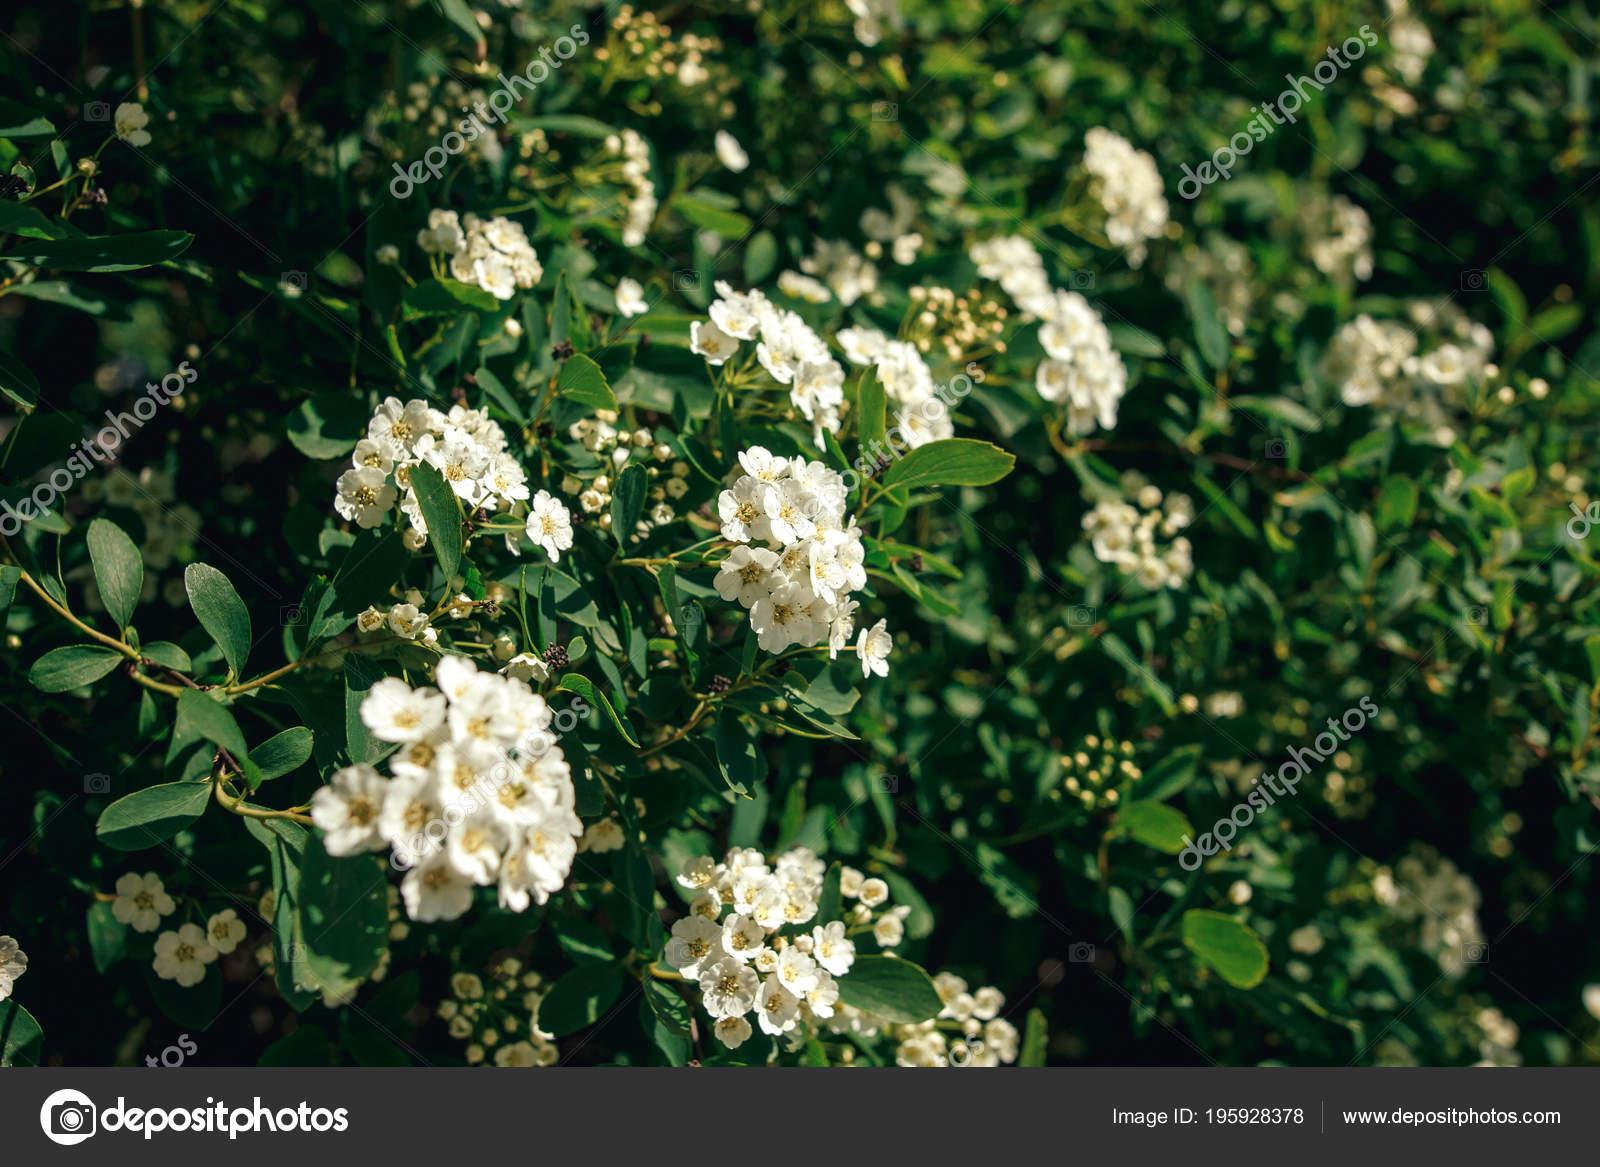 Beautiful Spirea White Flowers Bush Sunny Summer Garden Enjoying